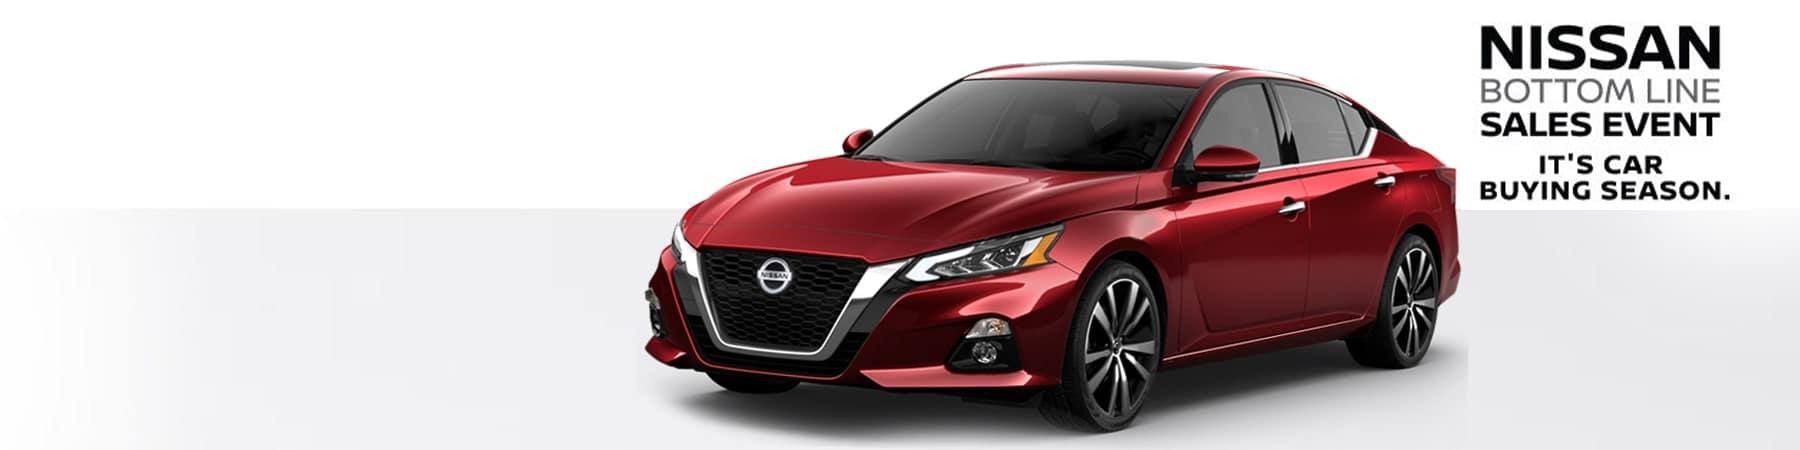 Nissan-Bottom-Line-Sales-Event-Altima-min